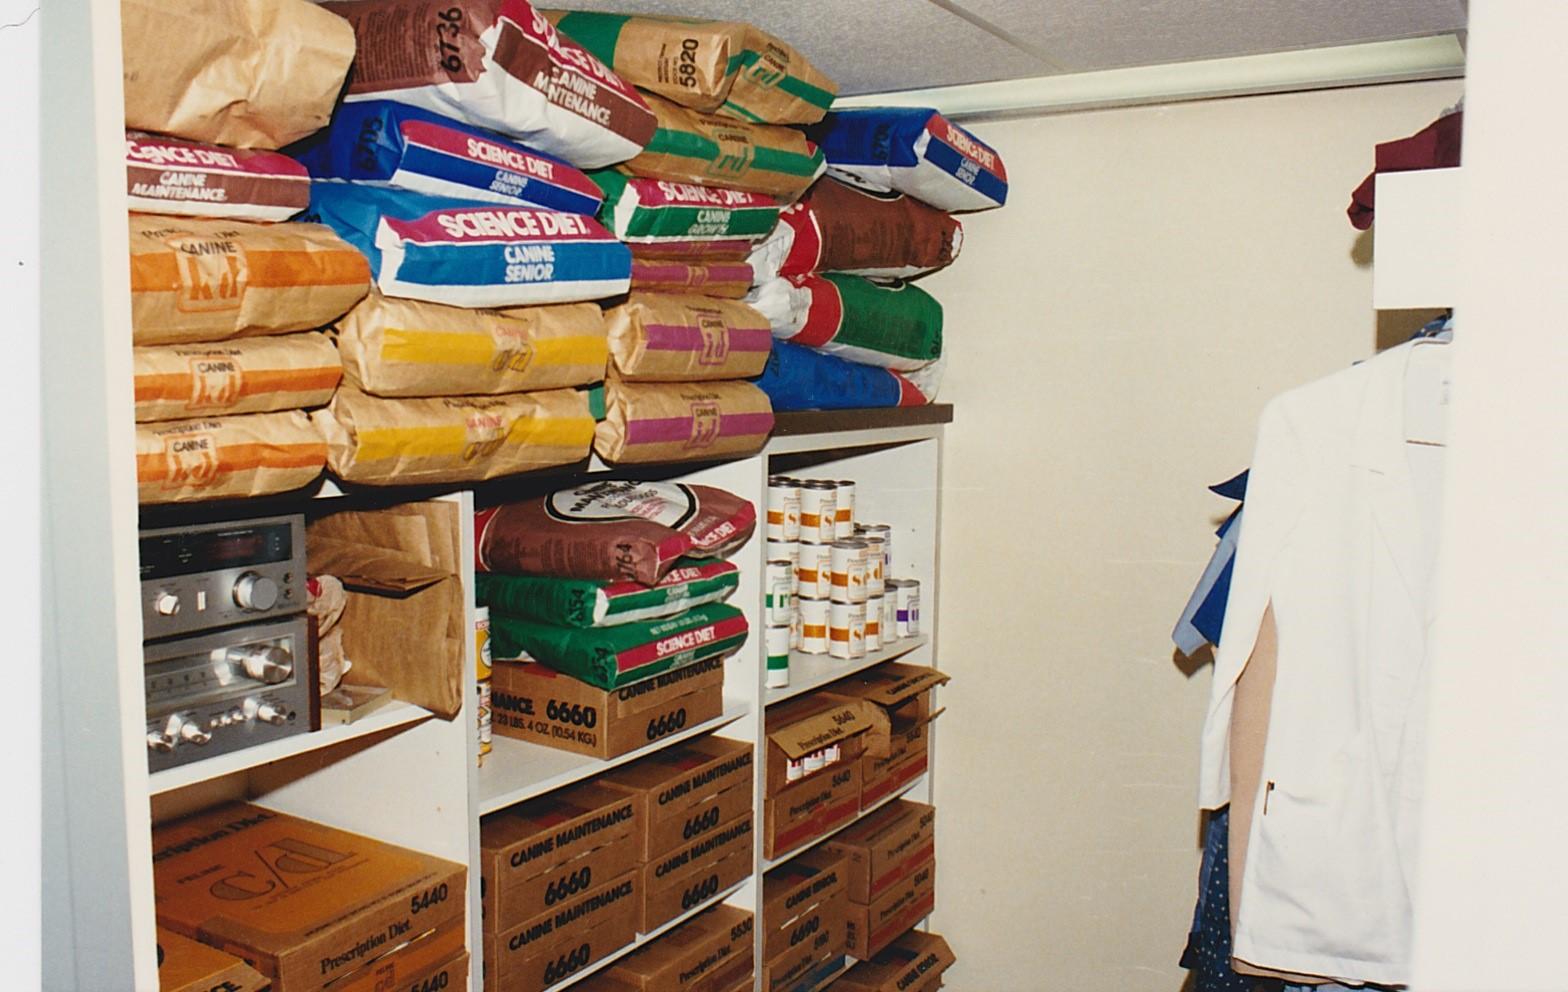 Food and smock storage